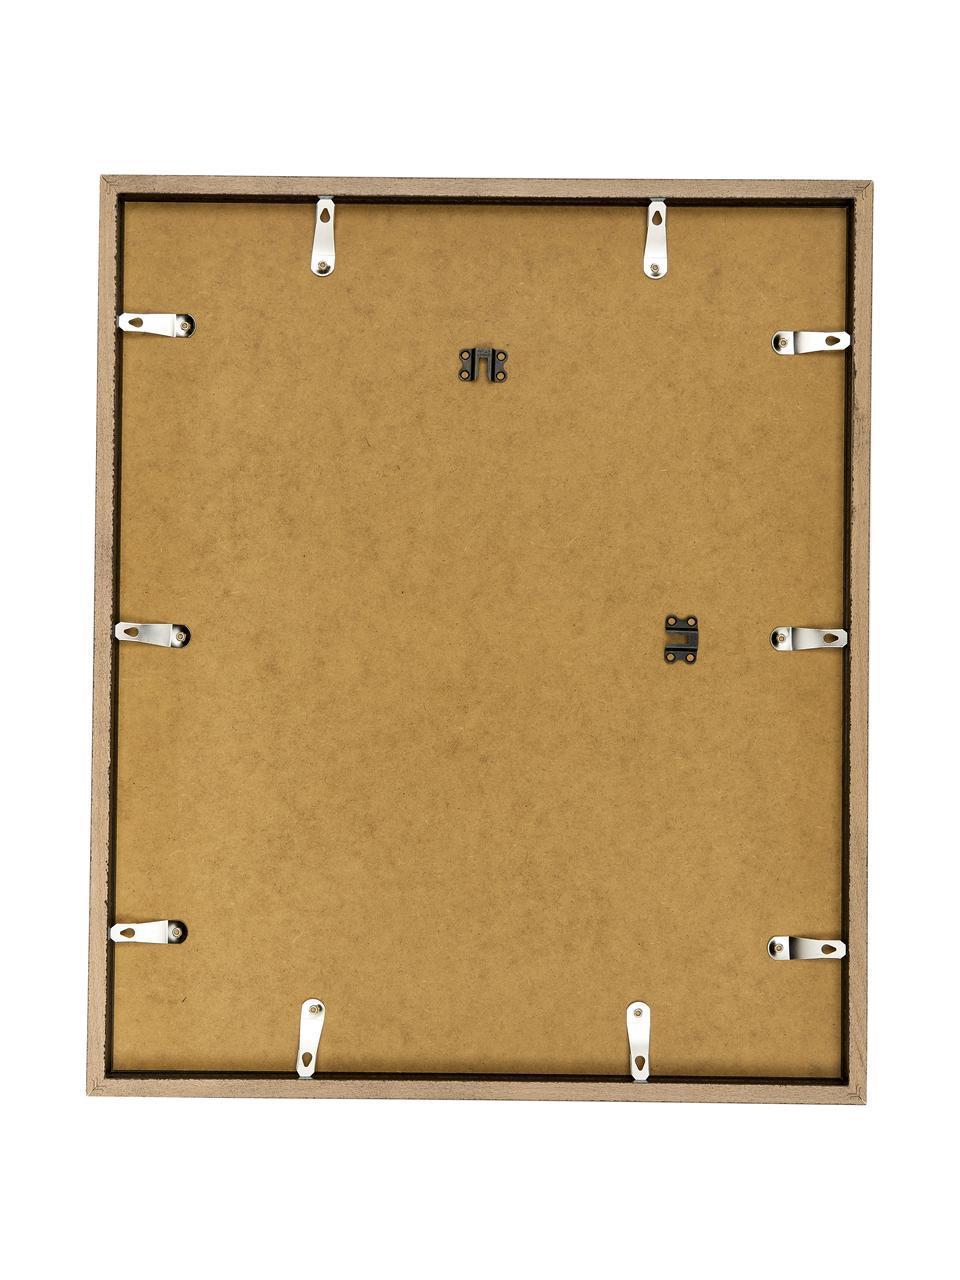 Gerahmter Digitaldruck Abstract Face II, Rahmen: Buchenholz, lackiert, Front: Plexiglas, Bild: Digitaldruck auf Papier, , Rahmen: Schwarz, 53 x 63 cm